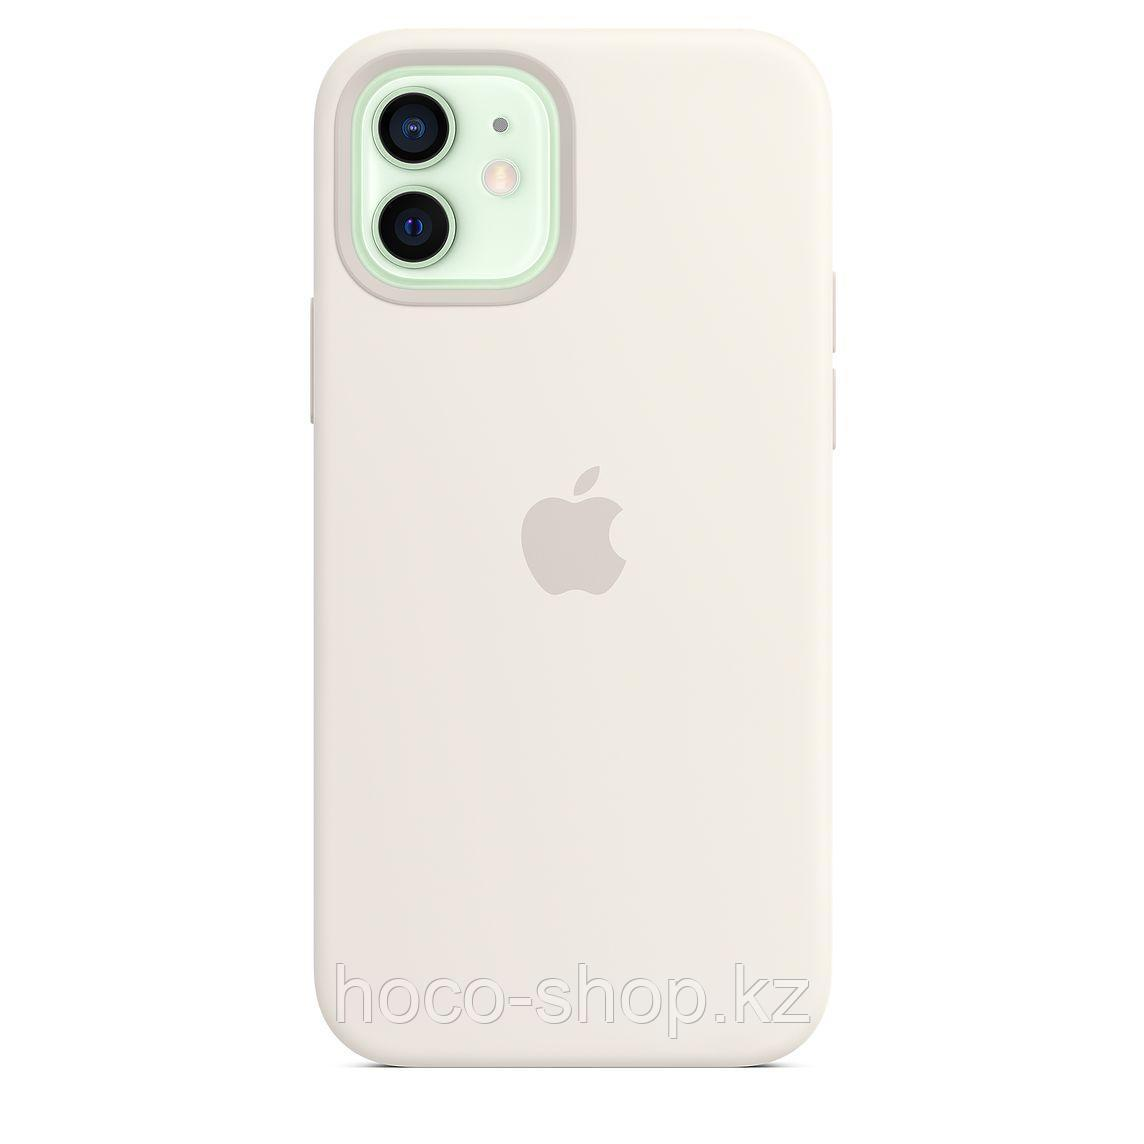 Чехол для смартфона iPhone 12 with MagSafe белый